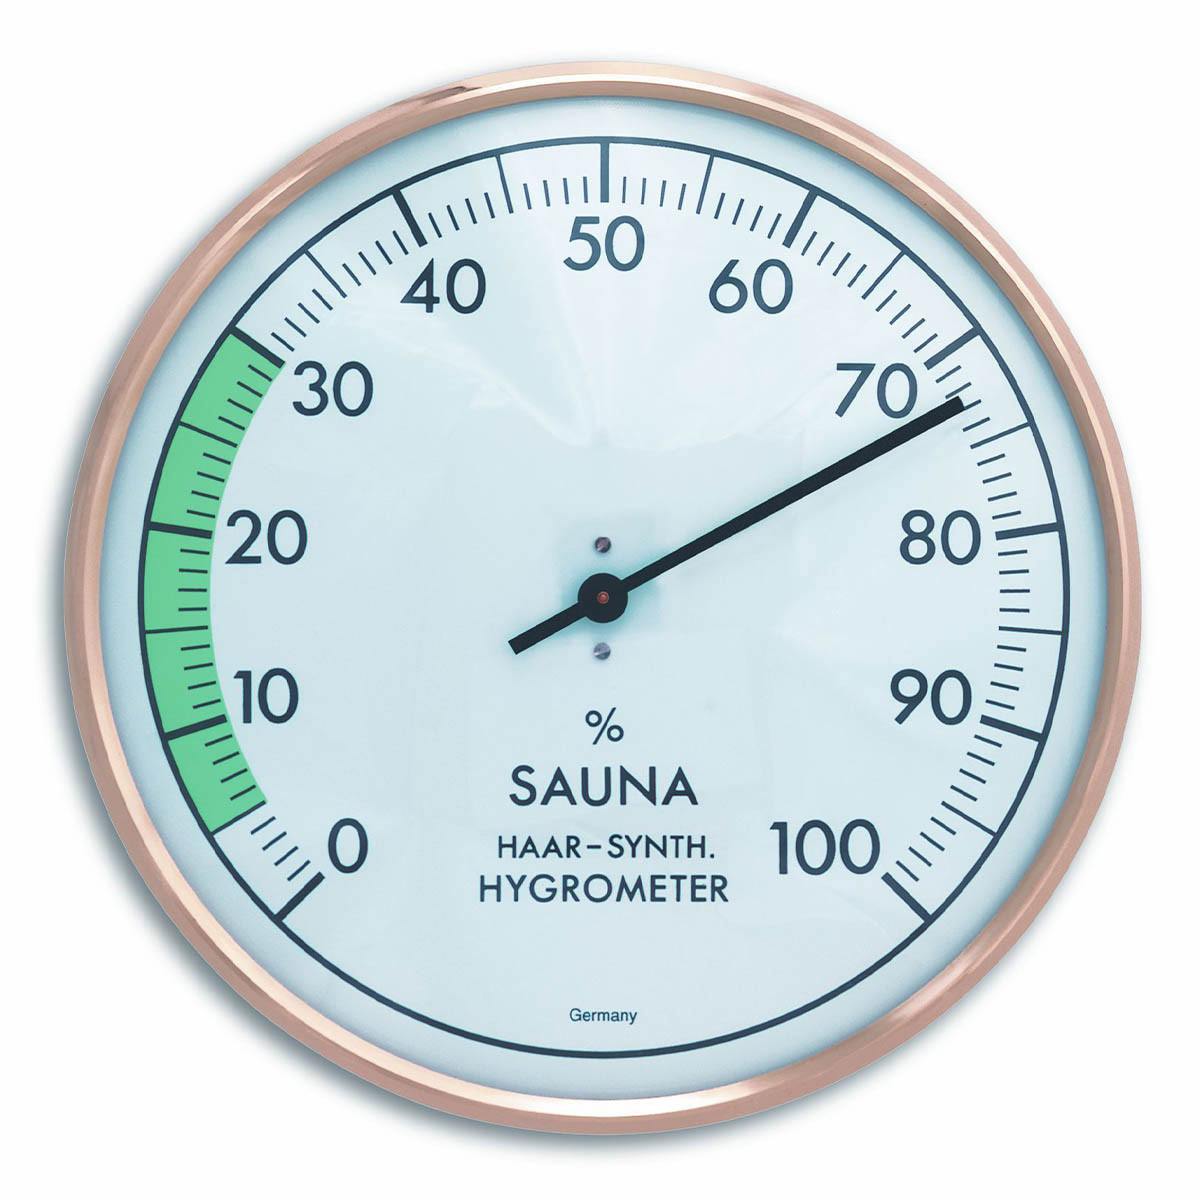 40-1012-analoges-sauna-hygrometer-mit-metallring-1200x1200px.jpg